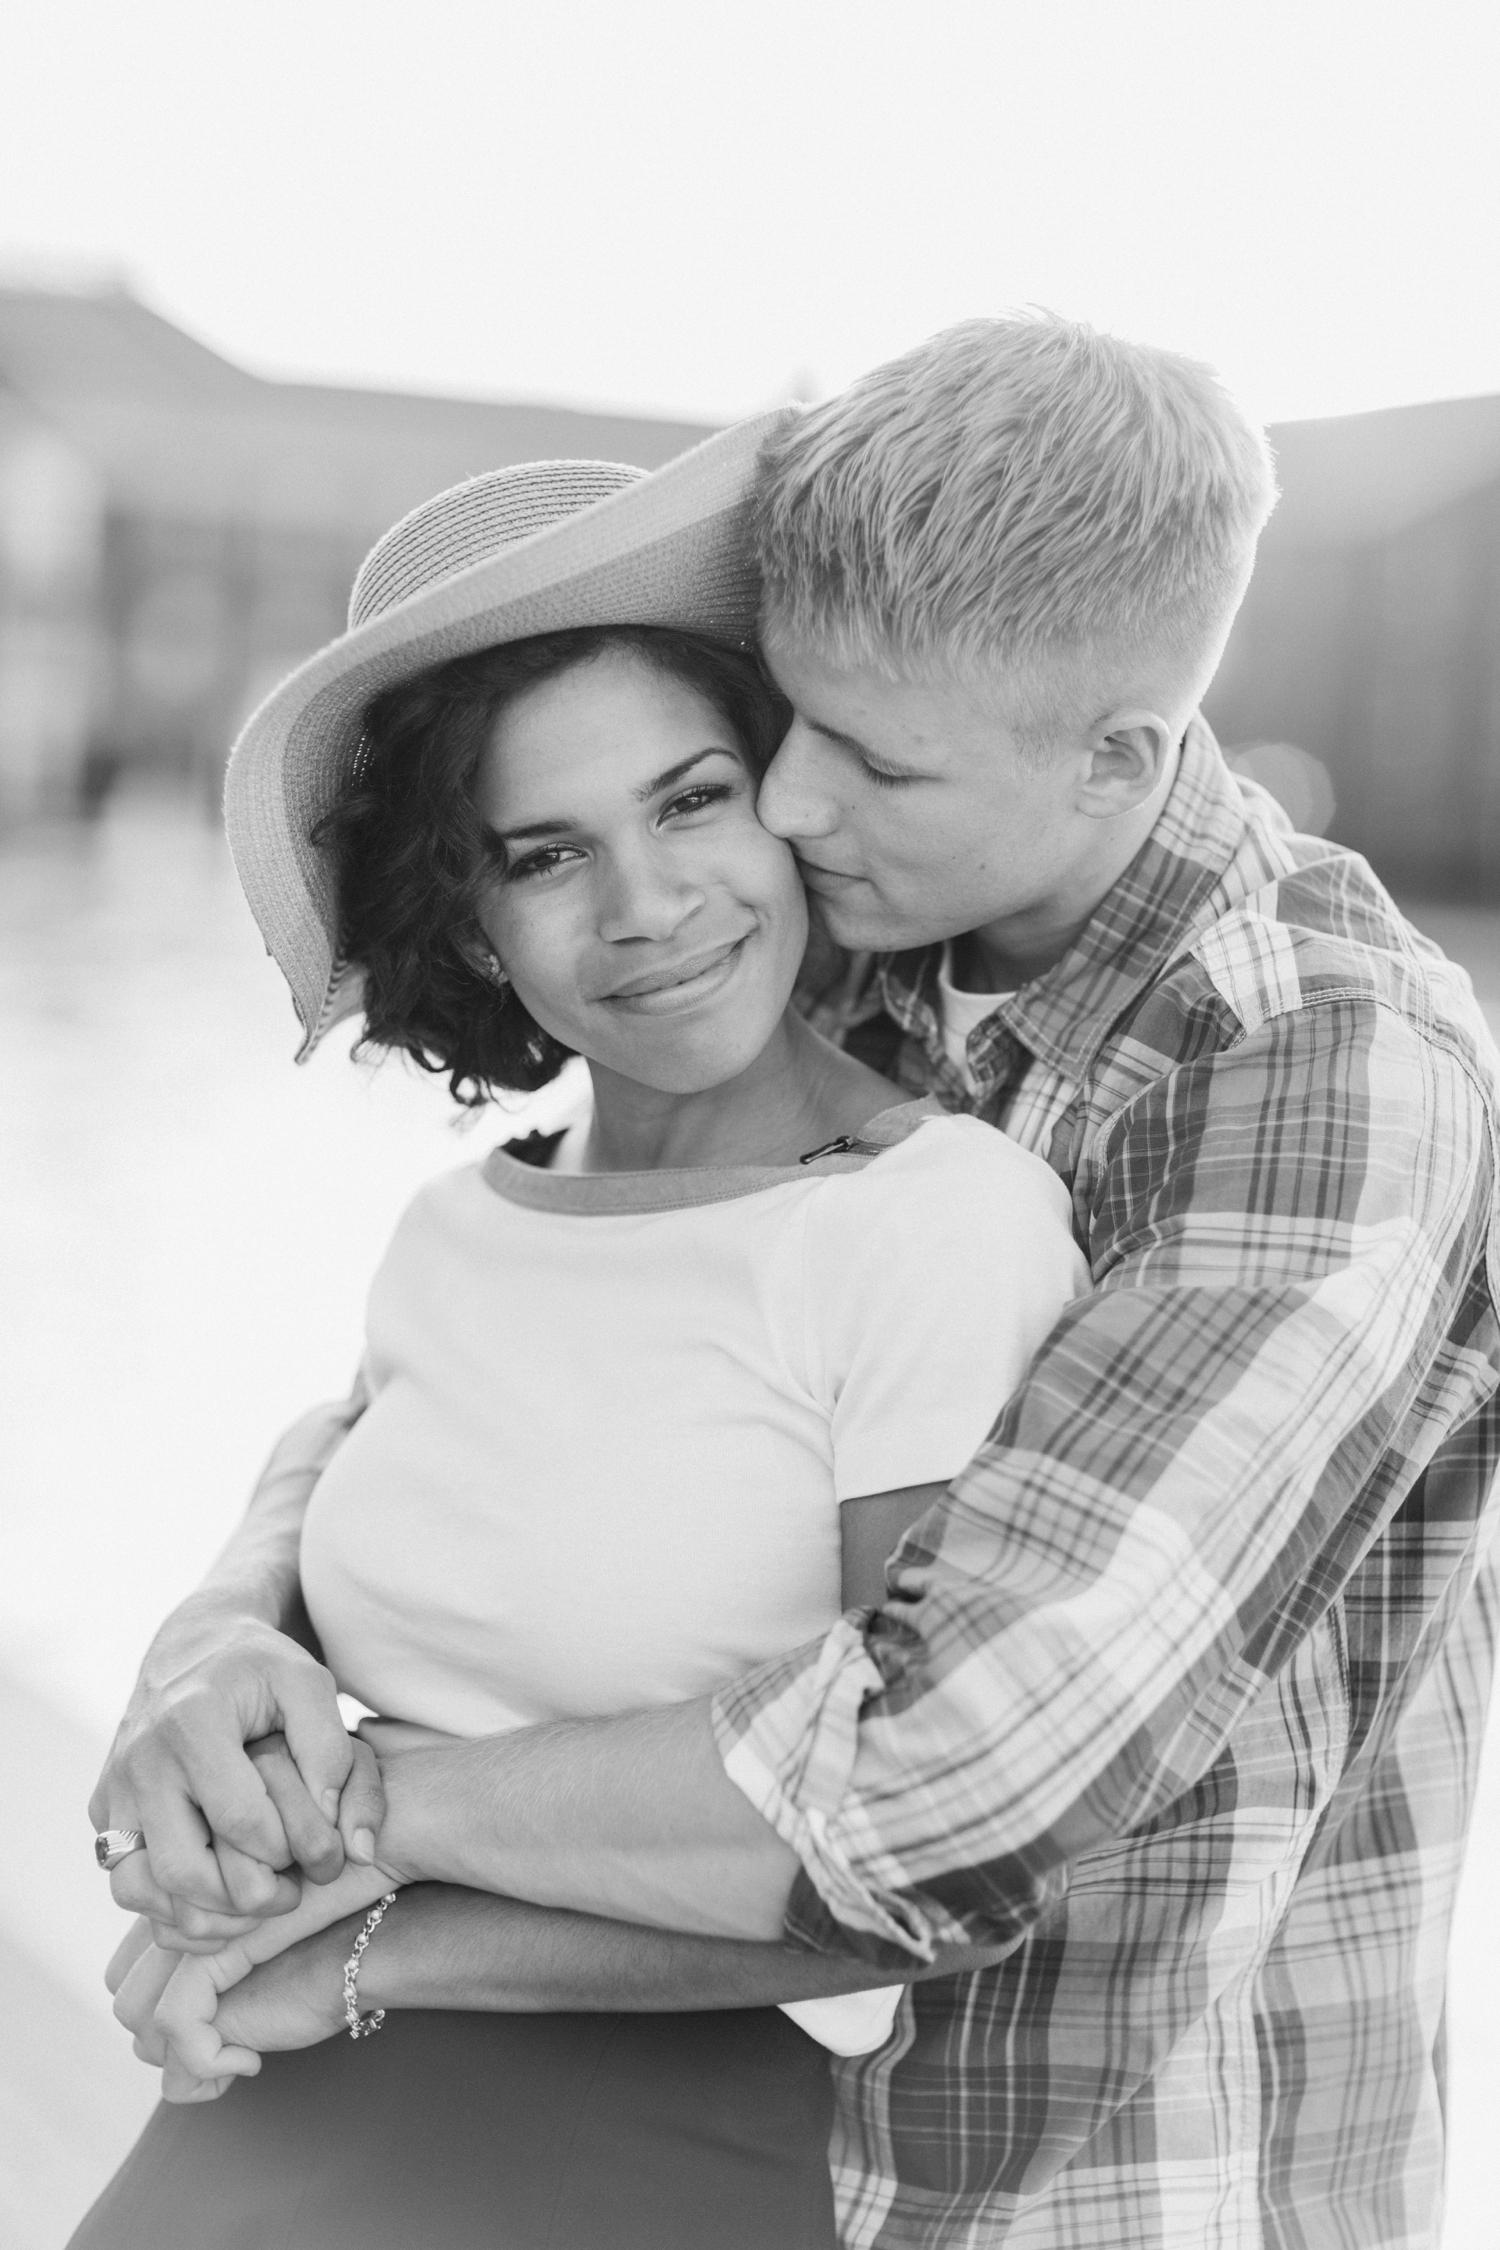 The_Palladium_Carmel_Indiana_Engagement_Photos_Chloe_Luka_Photography_7314.jpg